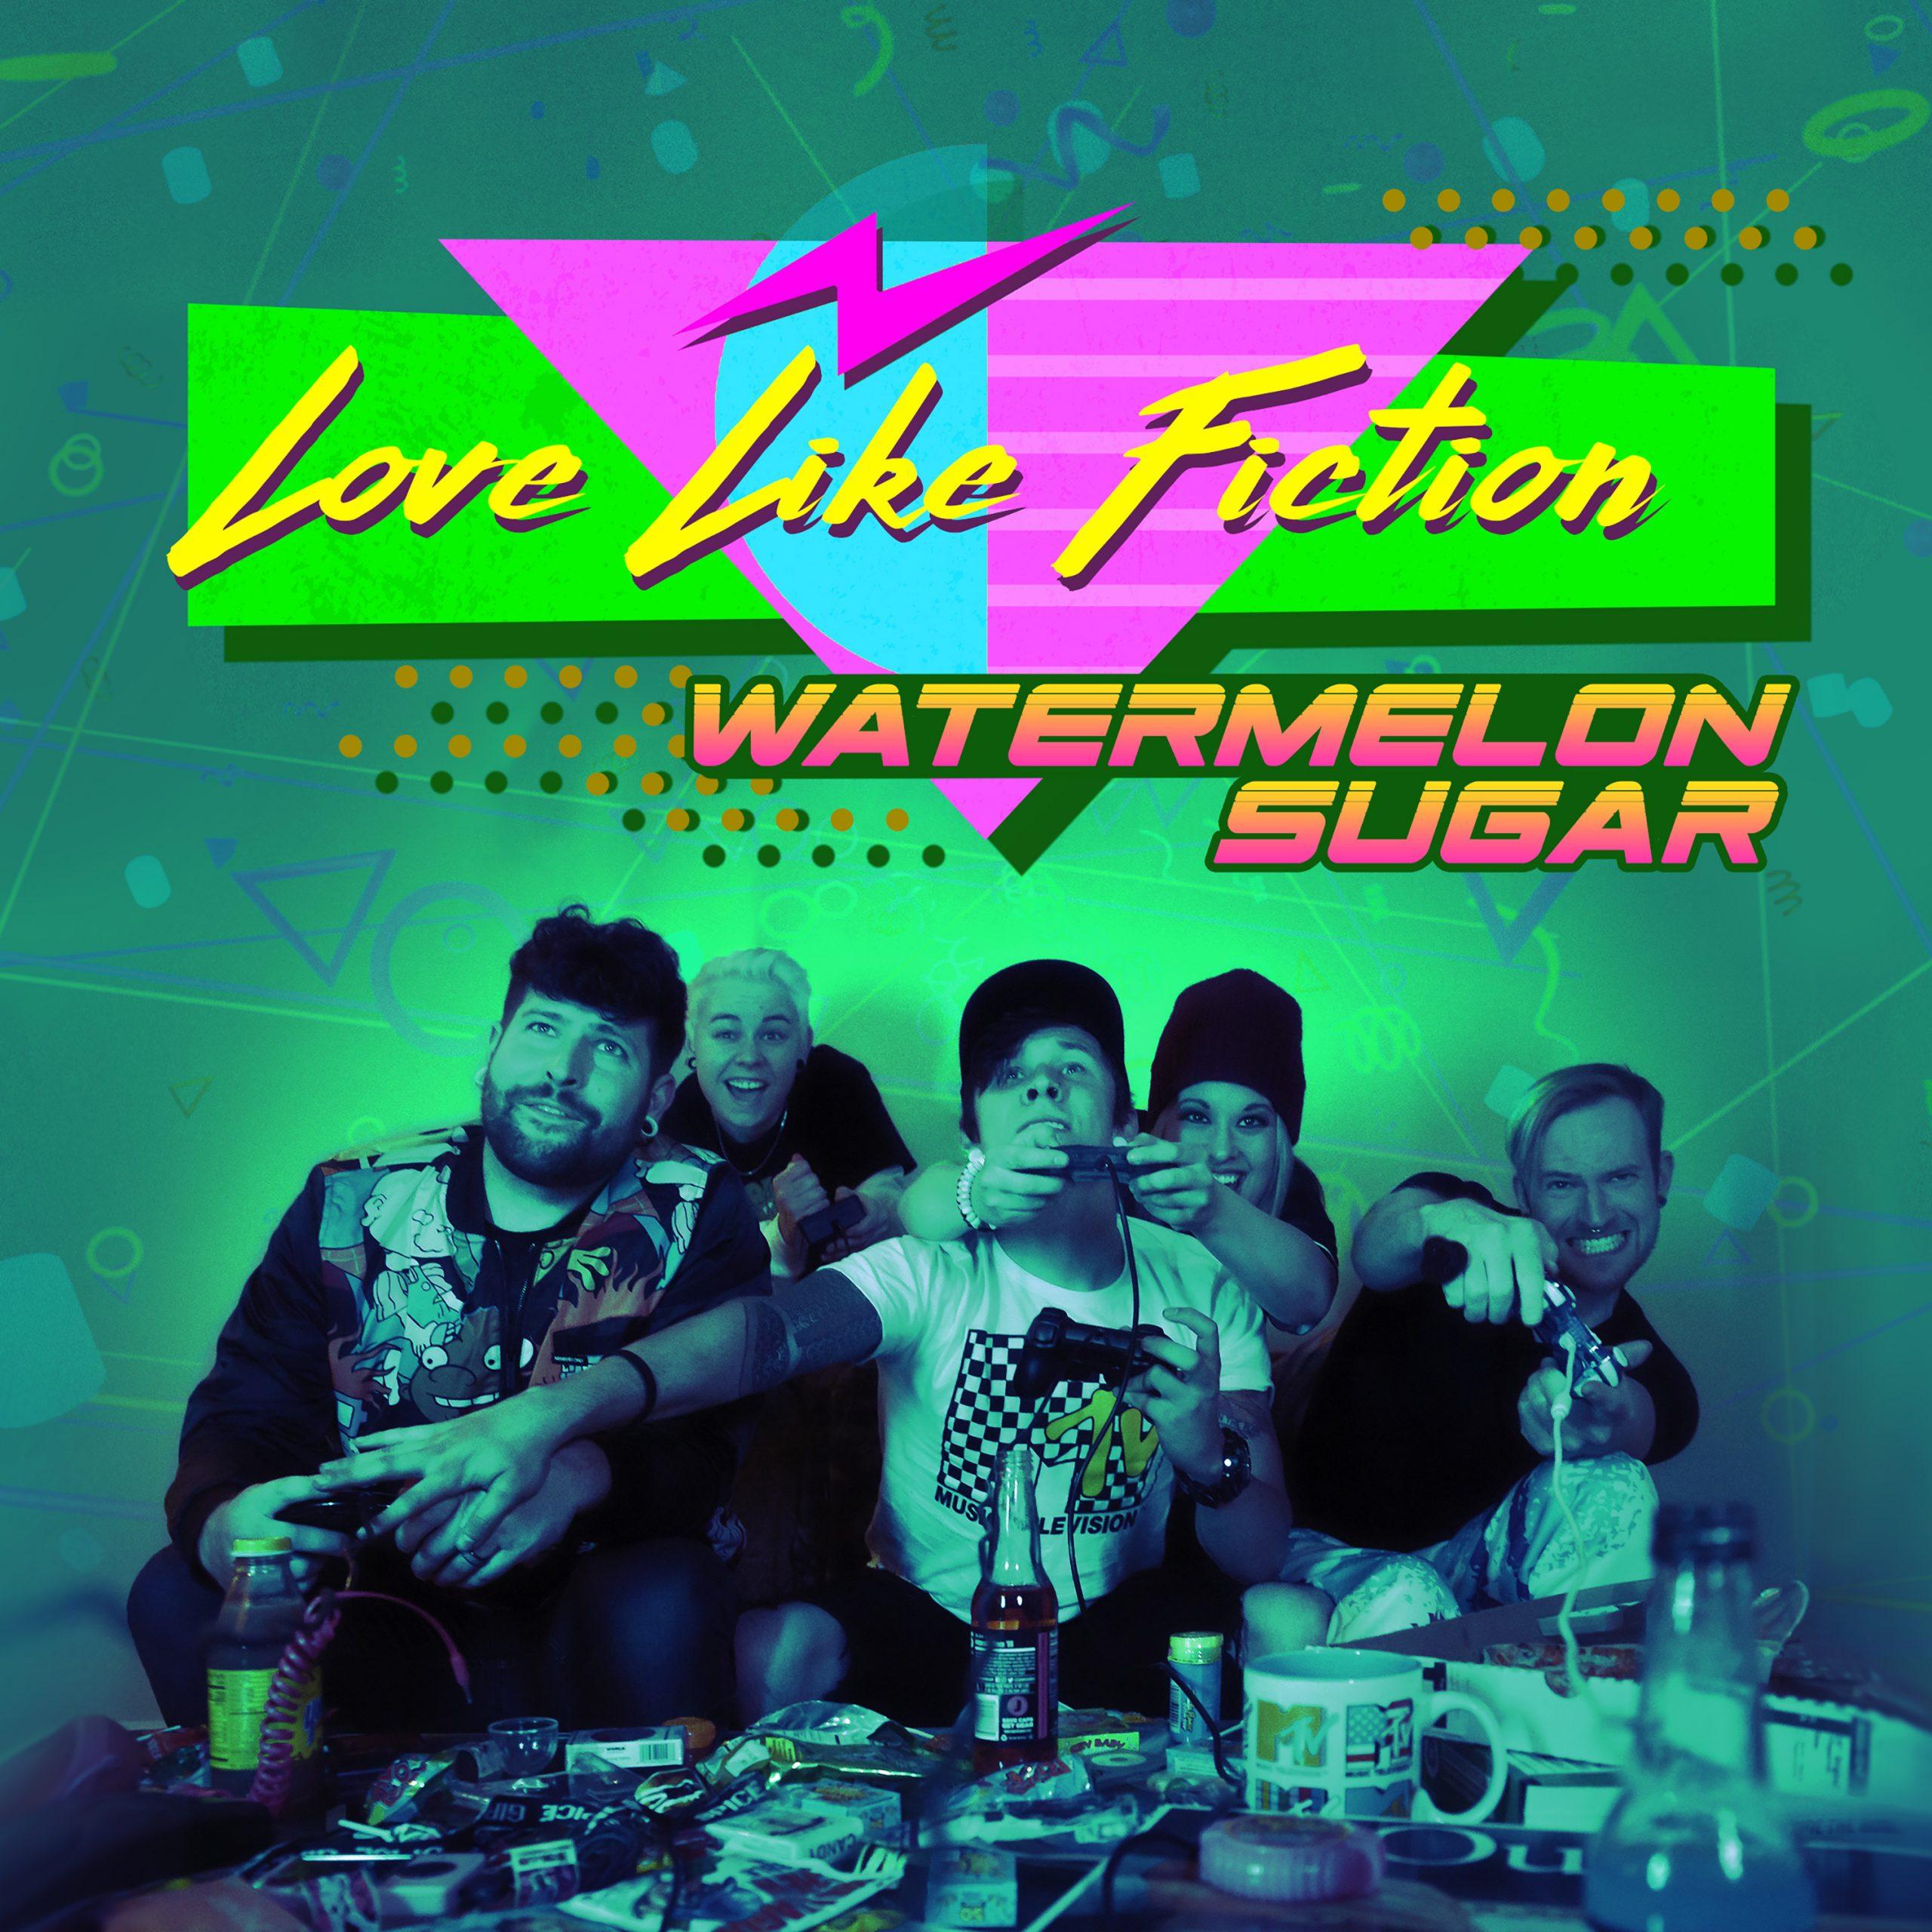 Love Like Fiction Watermelon Sugar